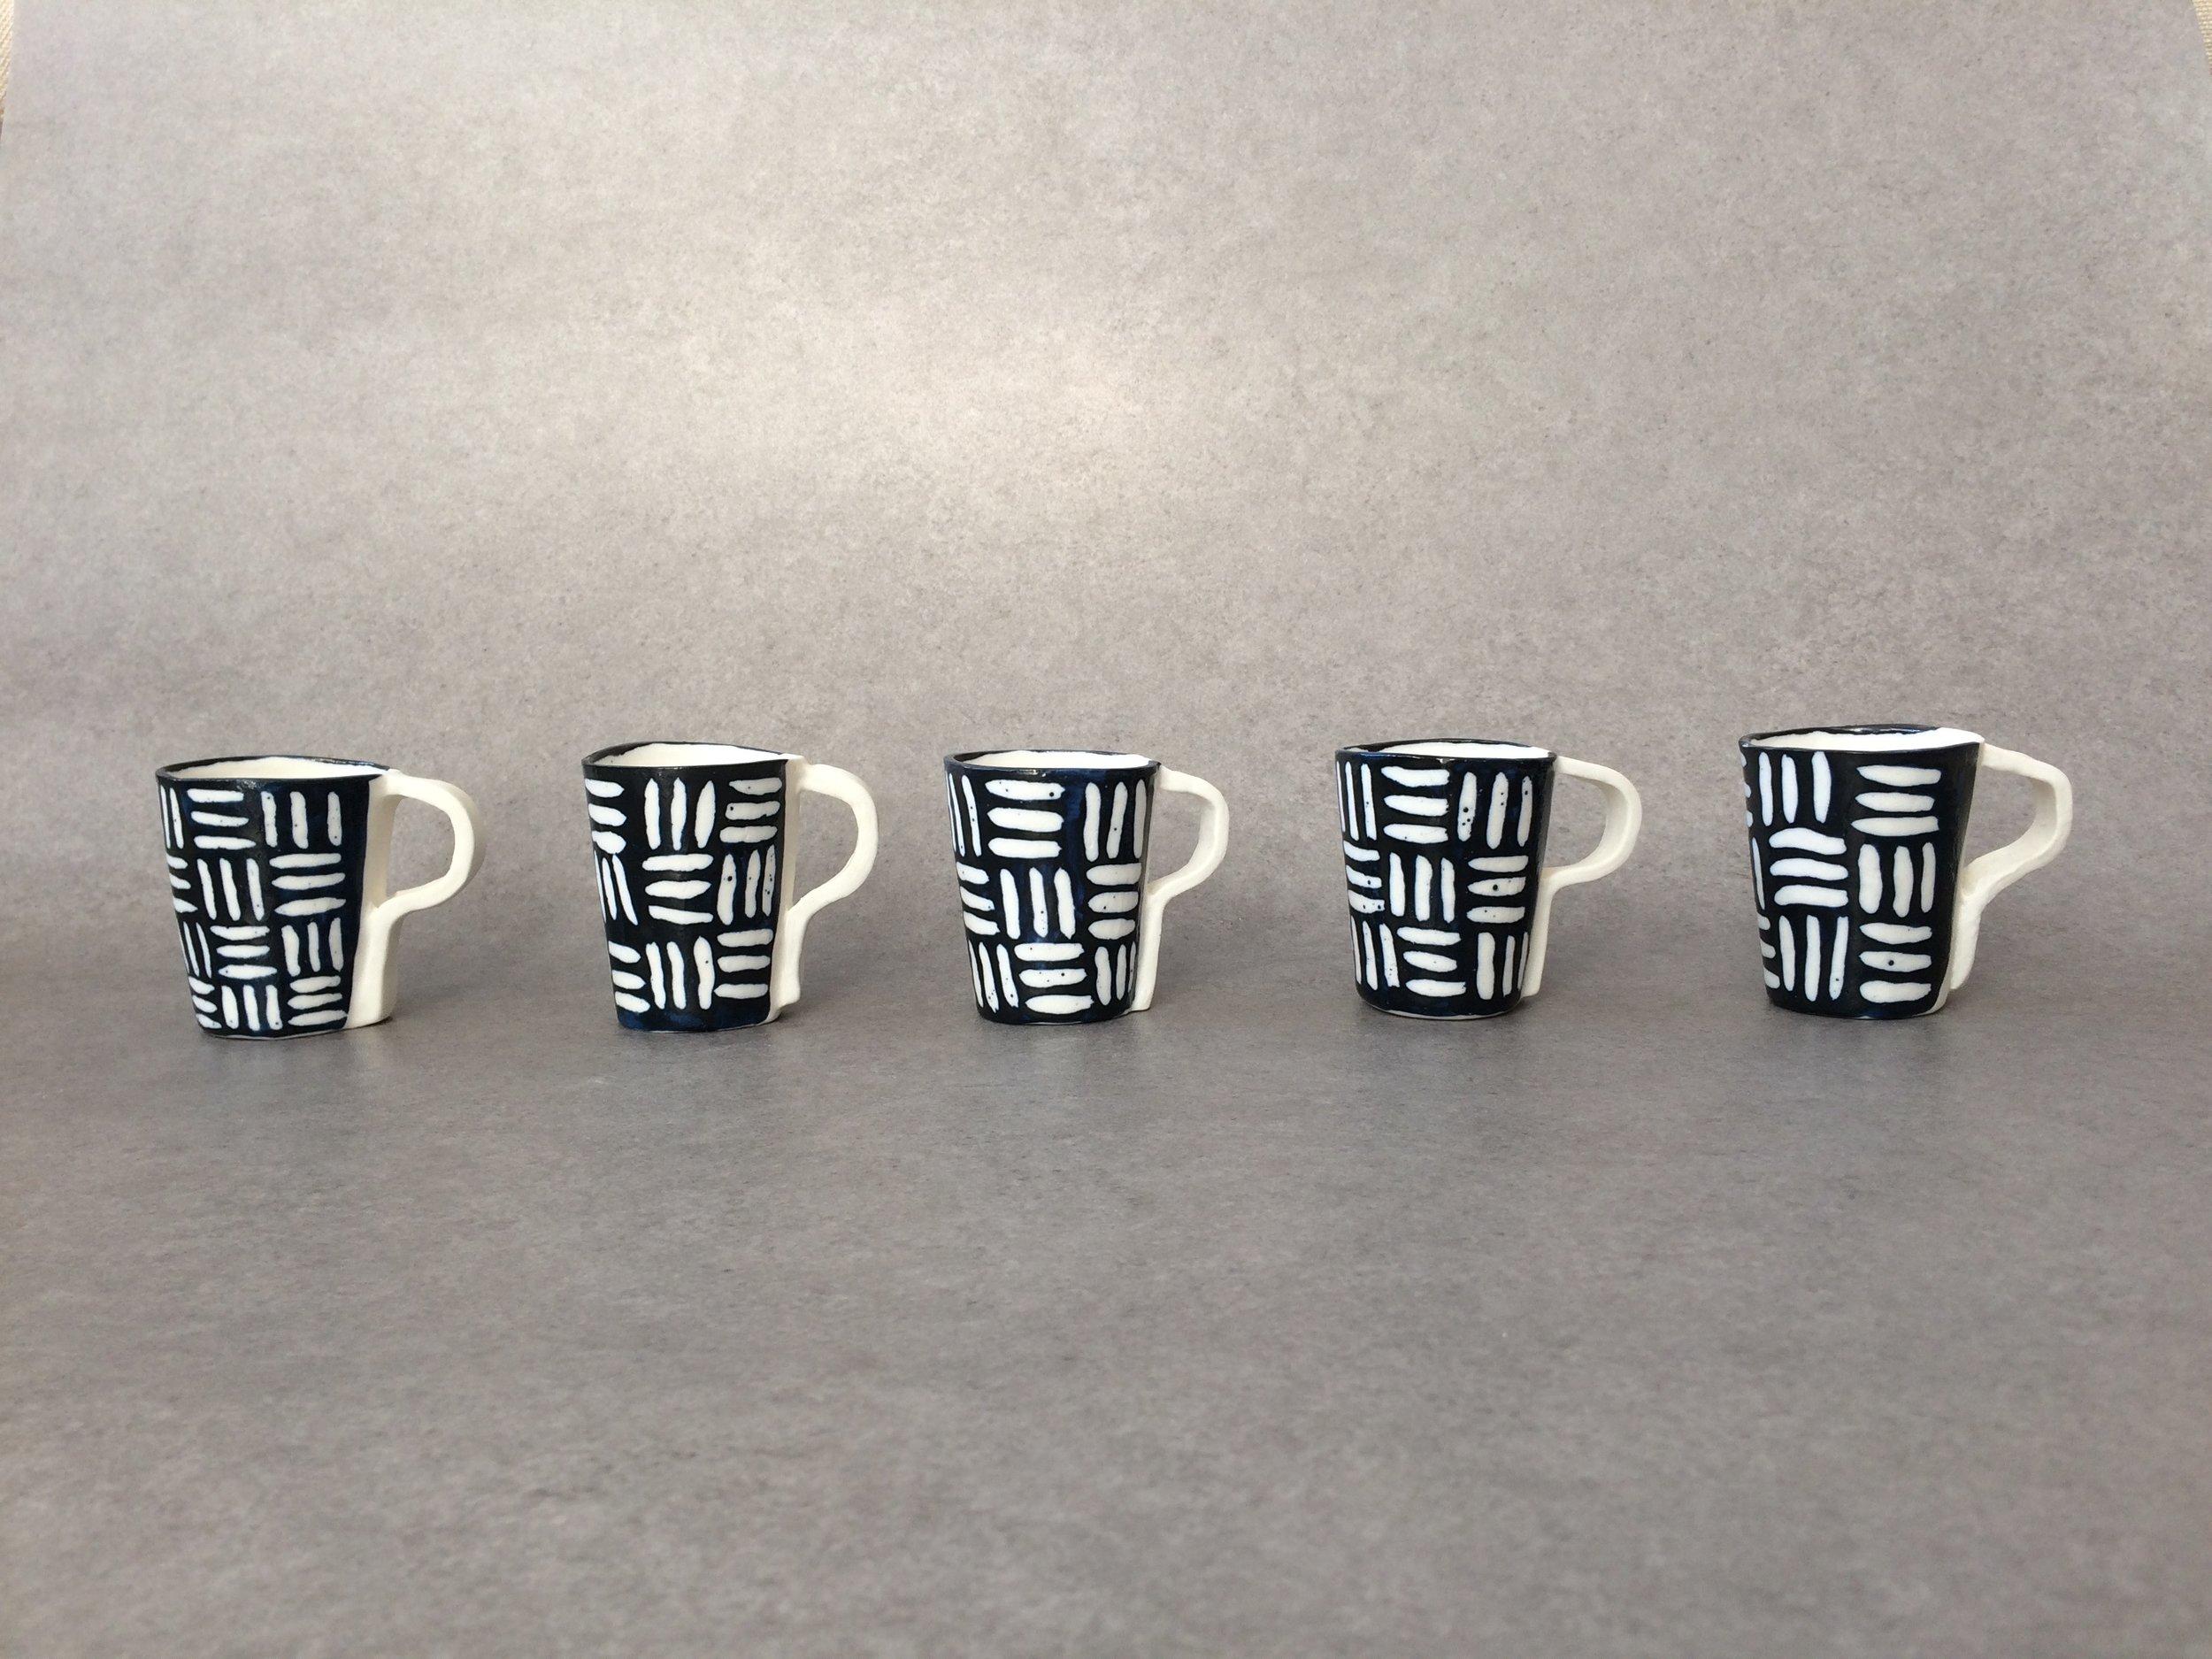 cross hatch cups 14.jpg